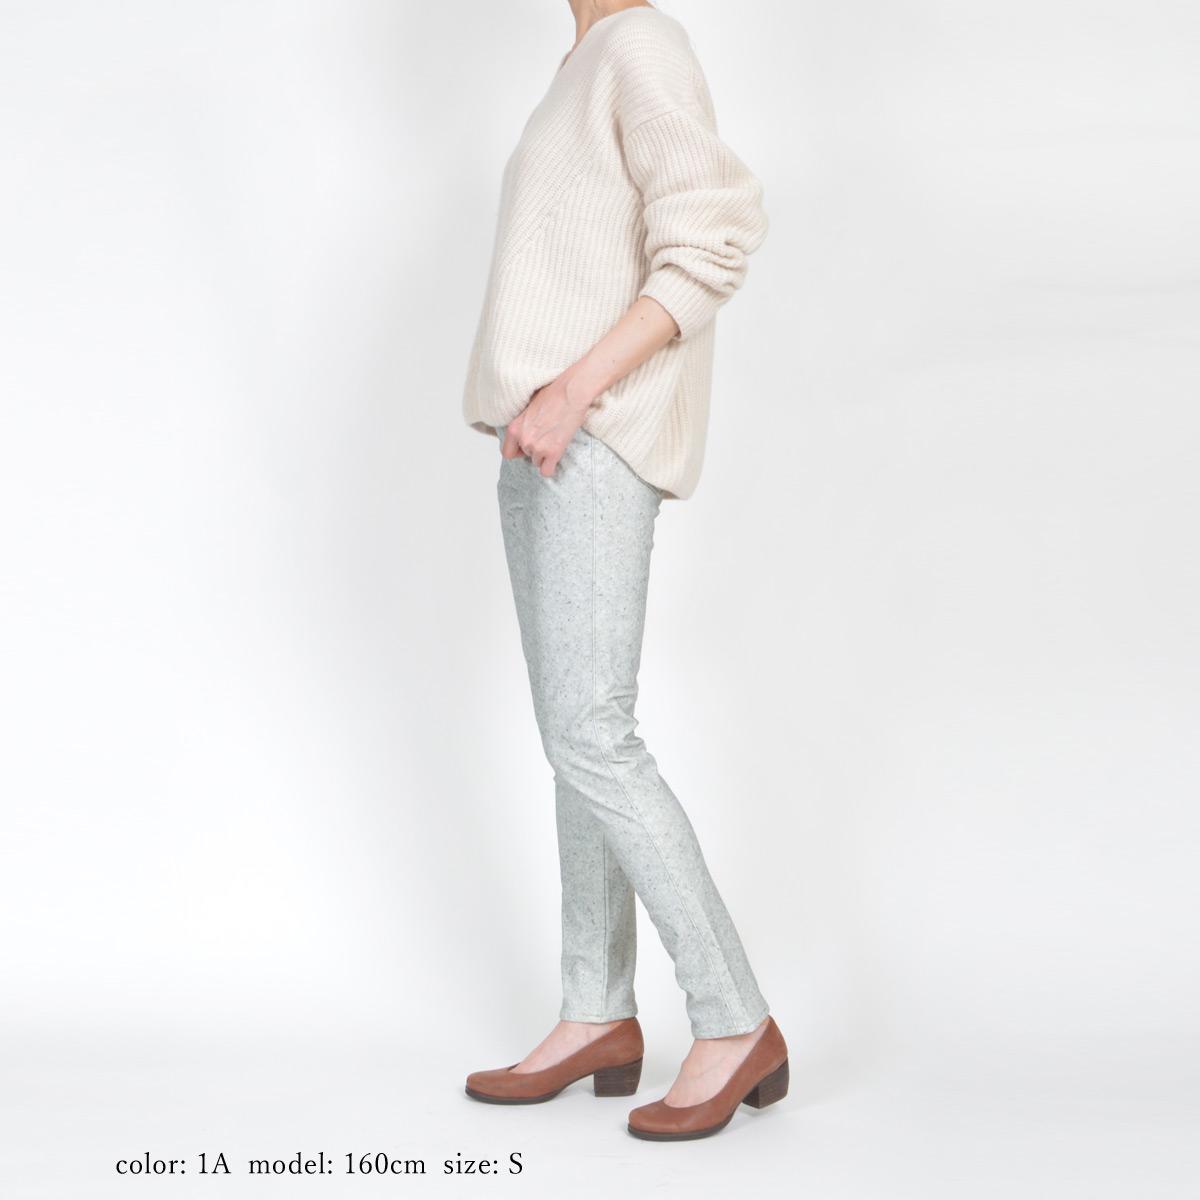 【SALE】Mrs.Jeana ■暖■ 裏起毛ハイテンションプリントスキニー MJ4491